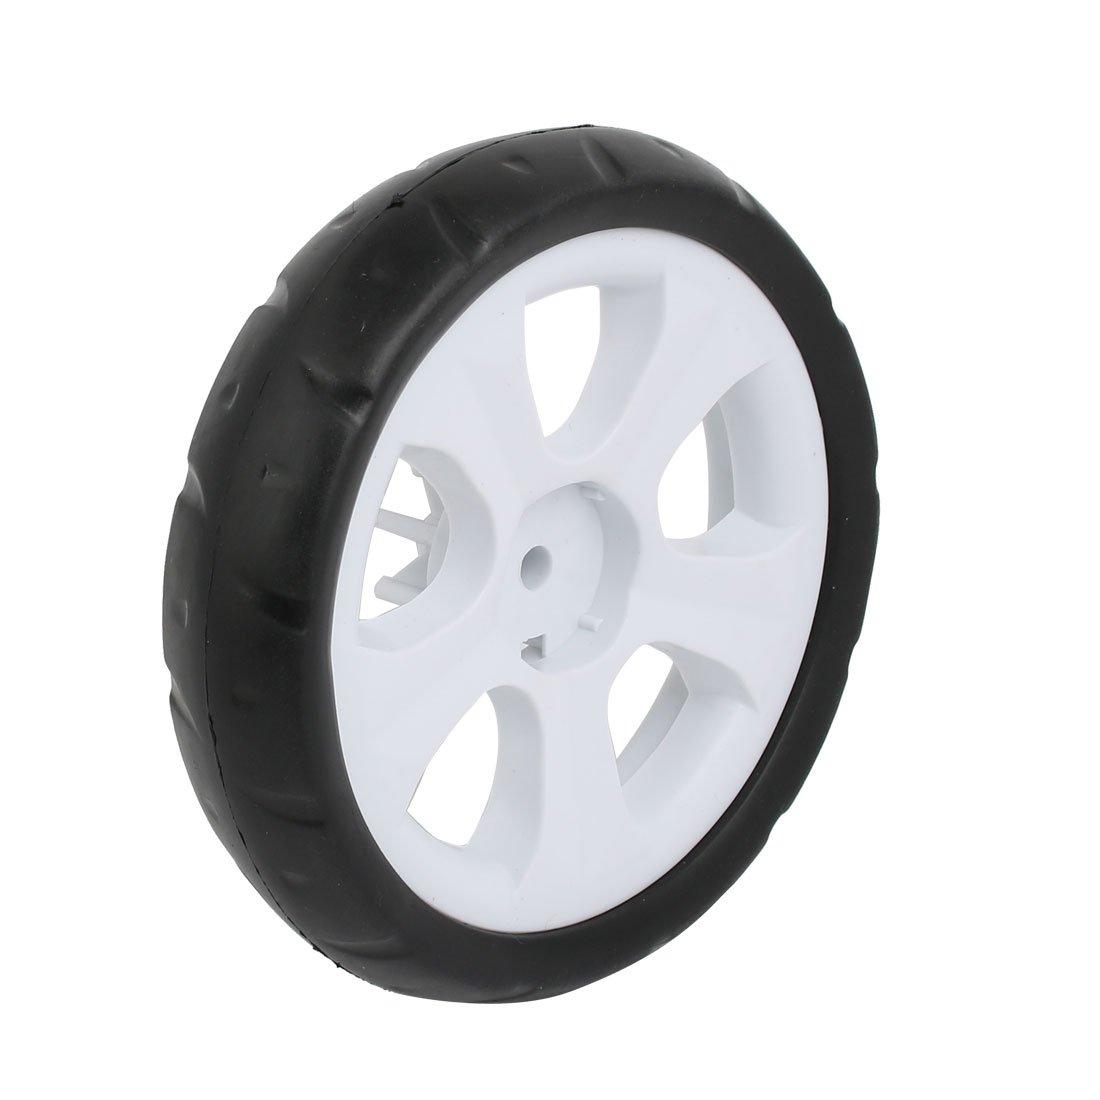 uxcell 155mm Diameter Plastic Single Wheel Pulley Rolling Roller